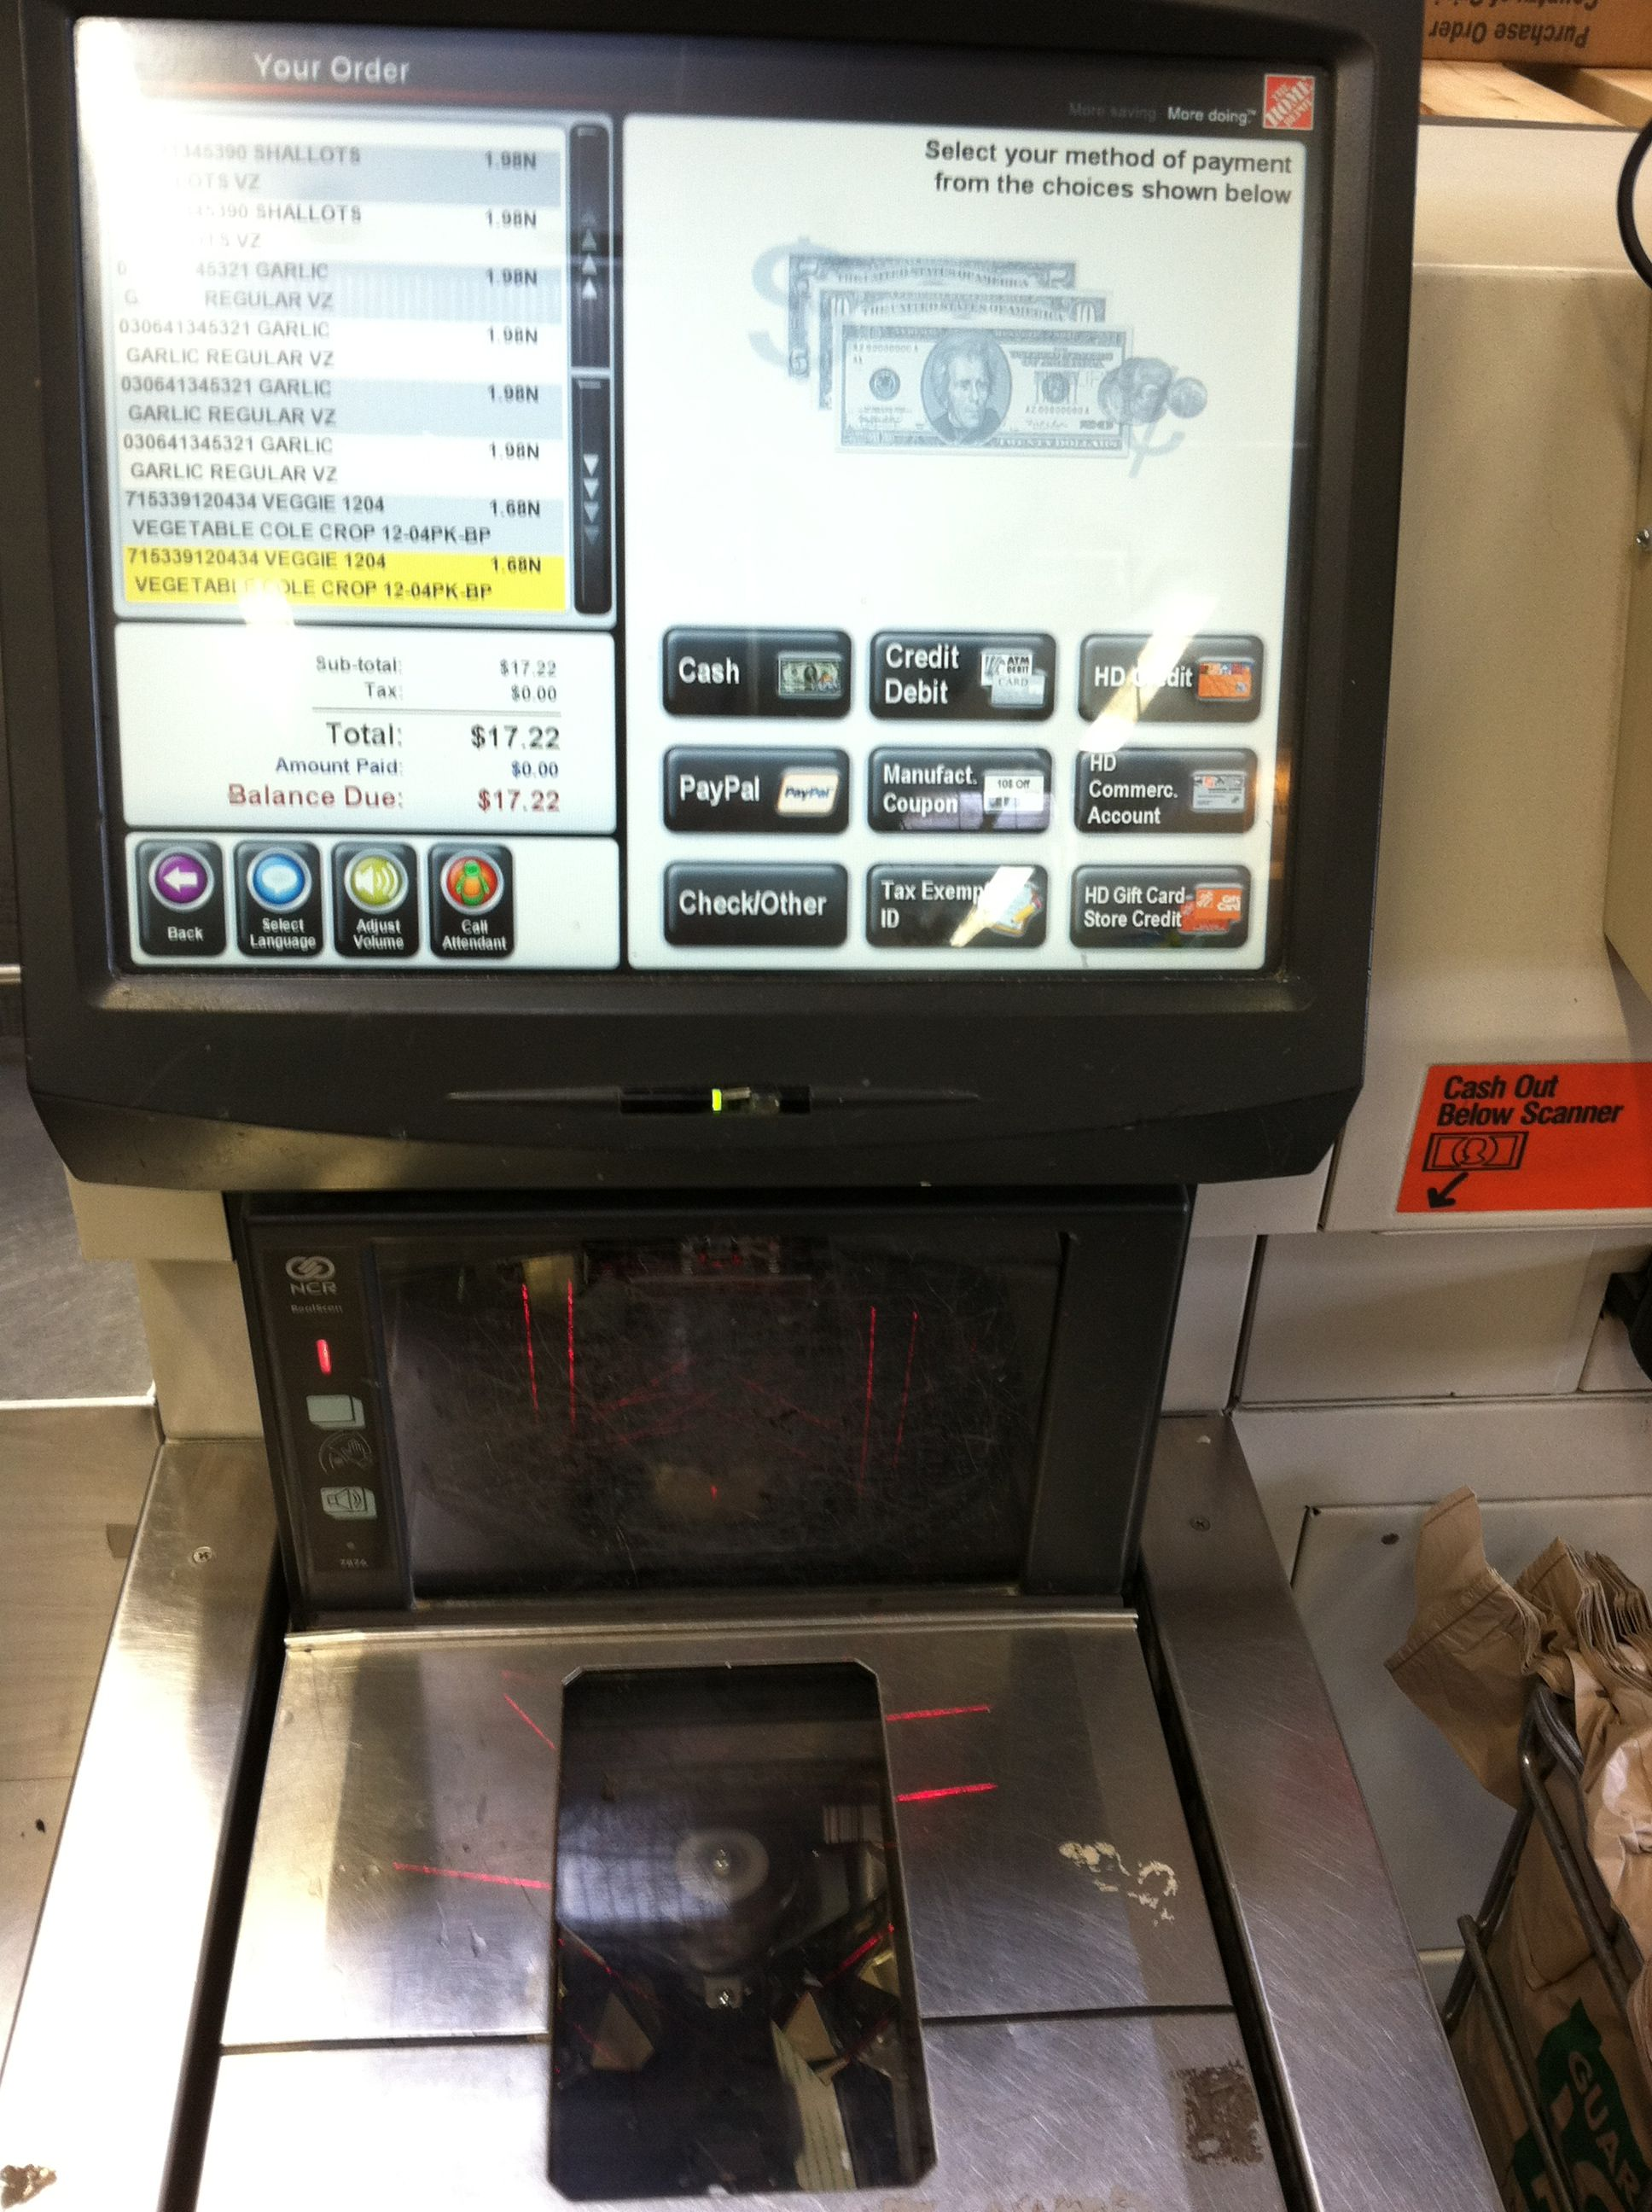 PayPal option on Home Depot Self Checkout Kiosk | Tech Watch ...